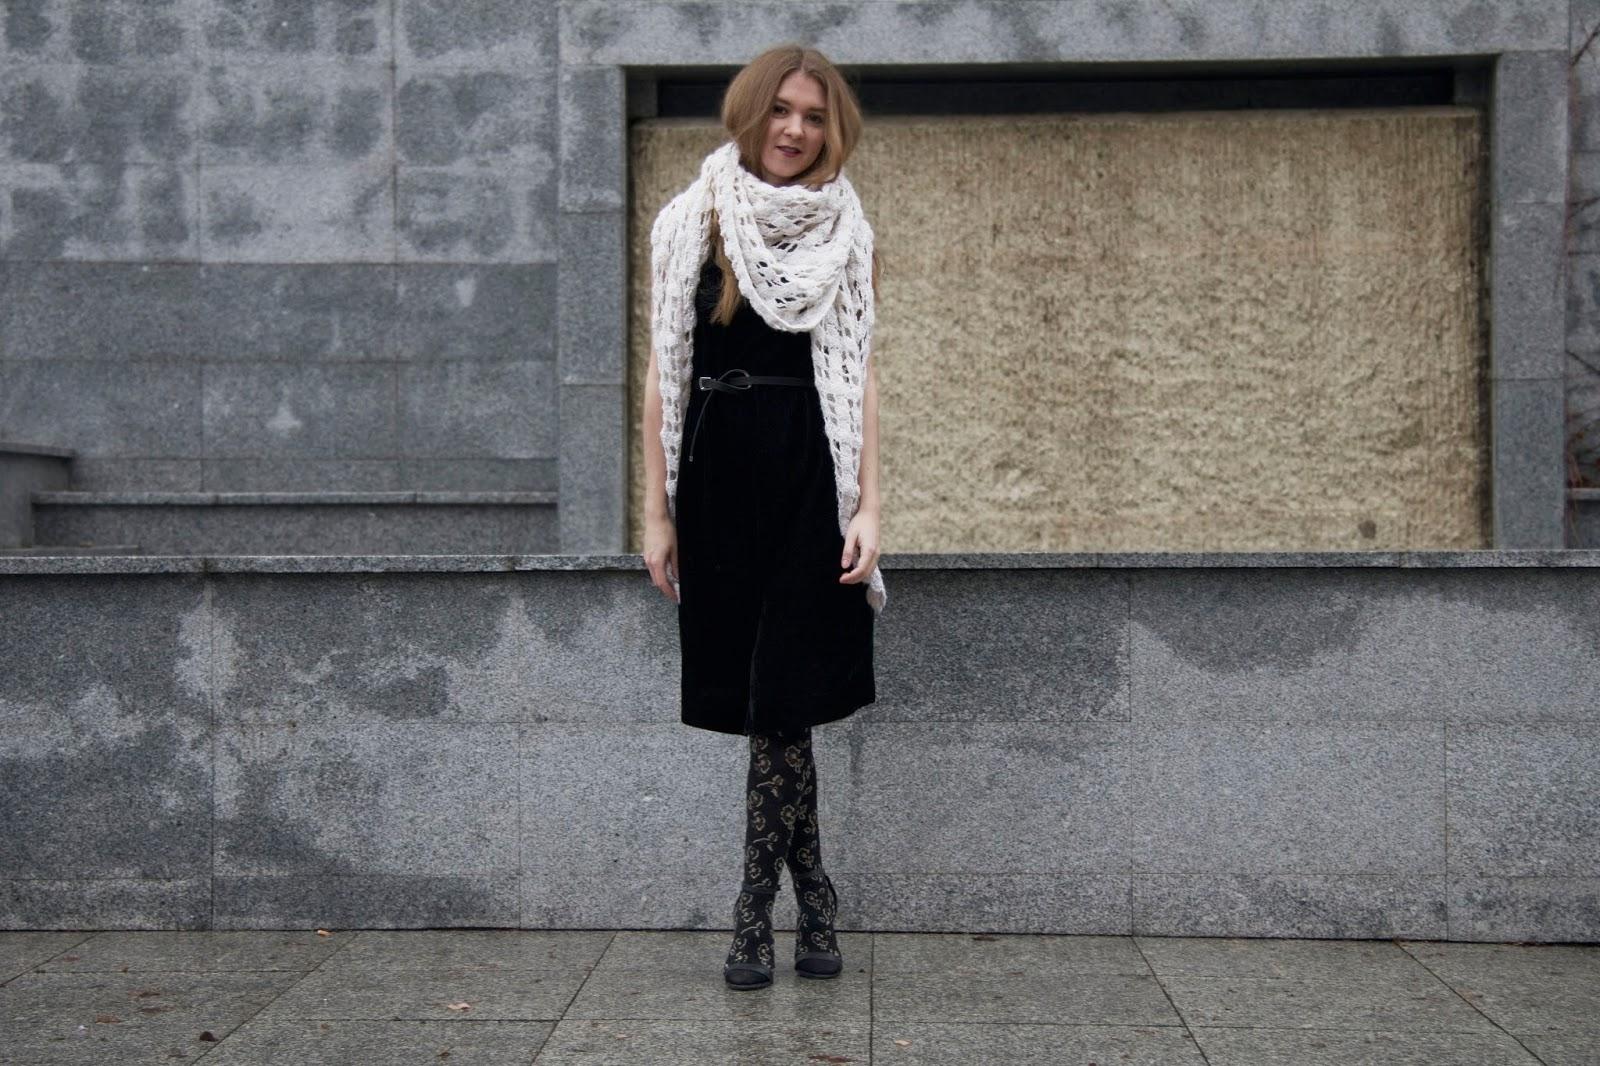 welurowa sukienka vintage na sylwestra